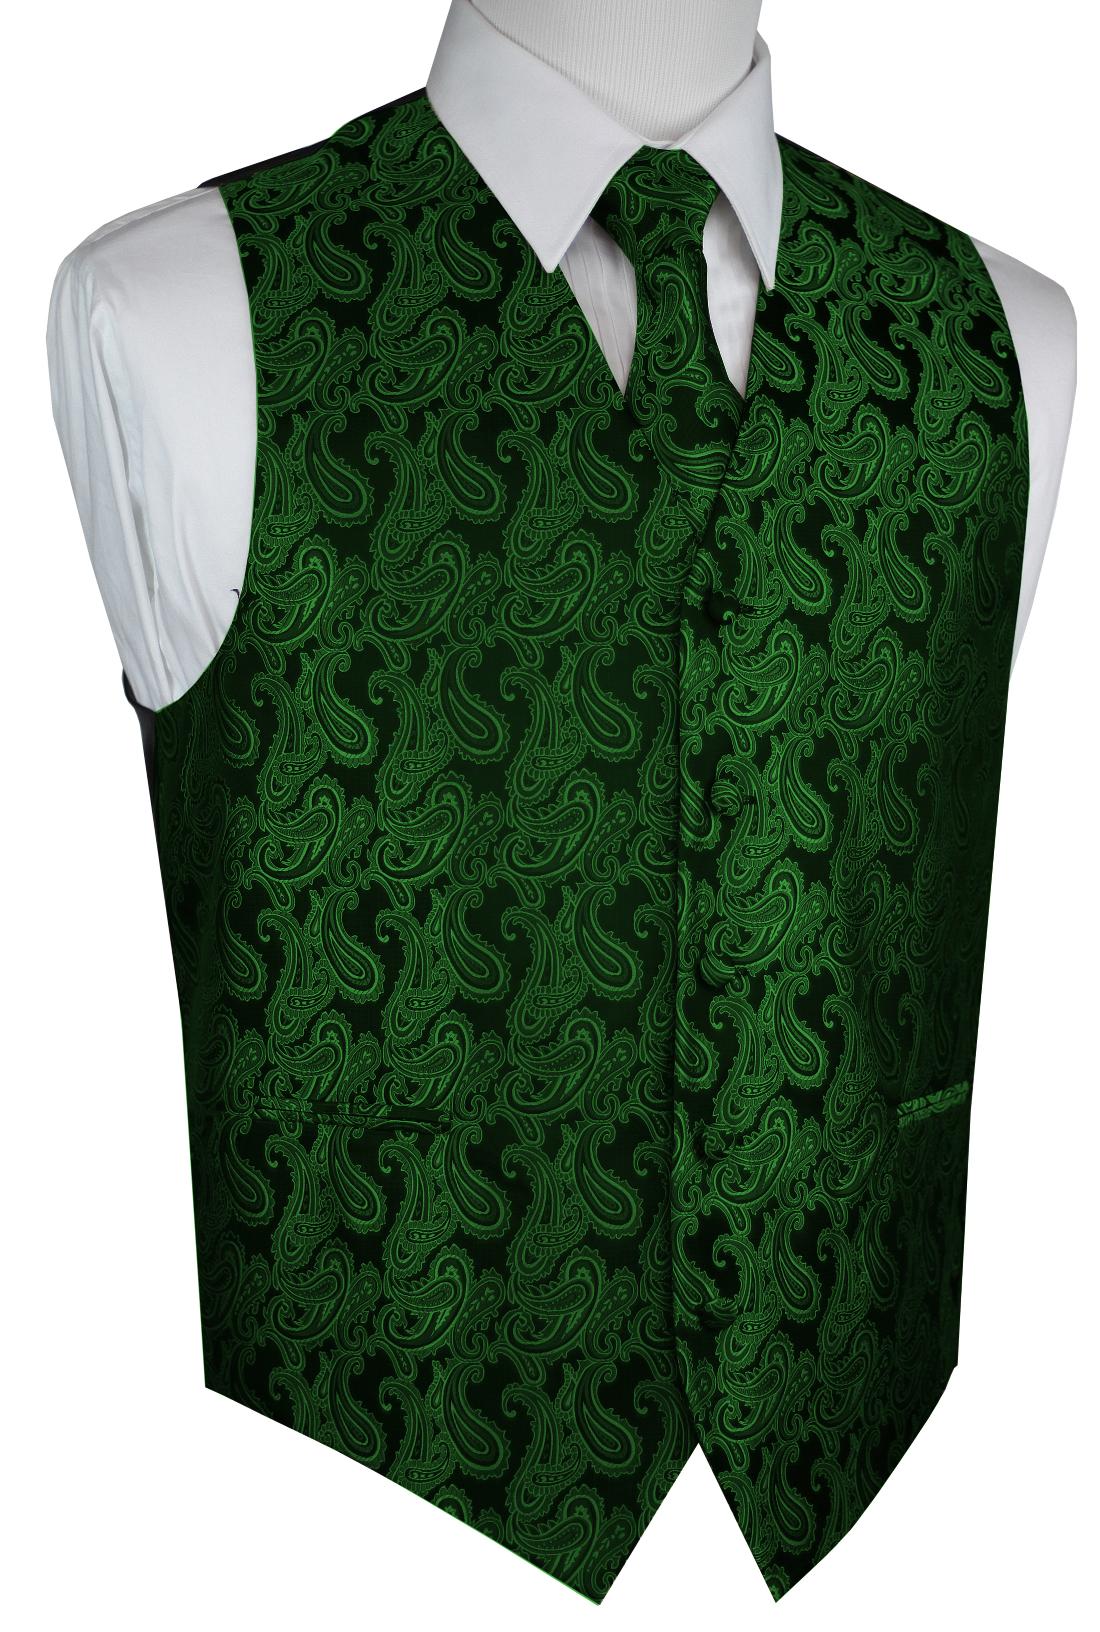 Italian Design, Men's Tuxedo Vest, Tie & Hankie Set - Green Paisley